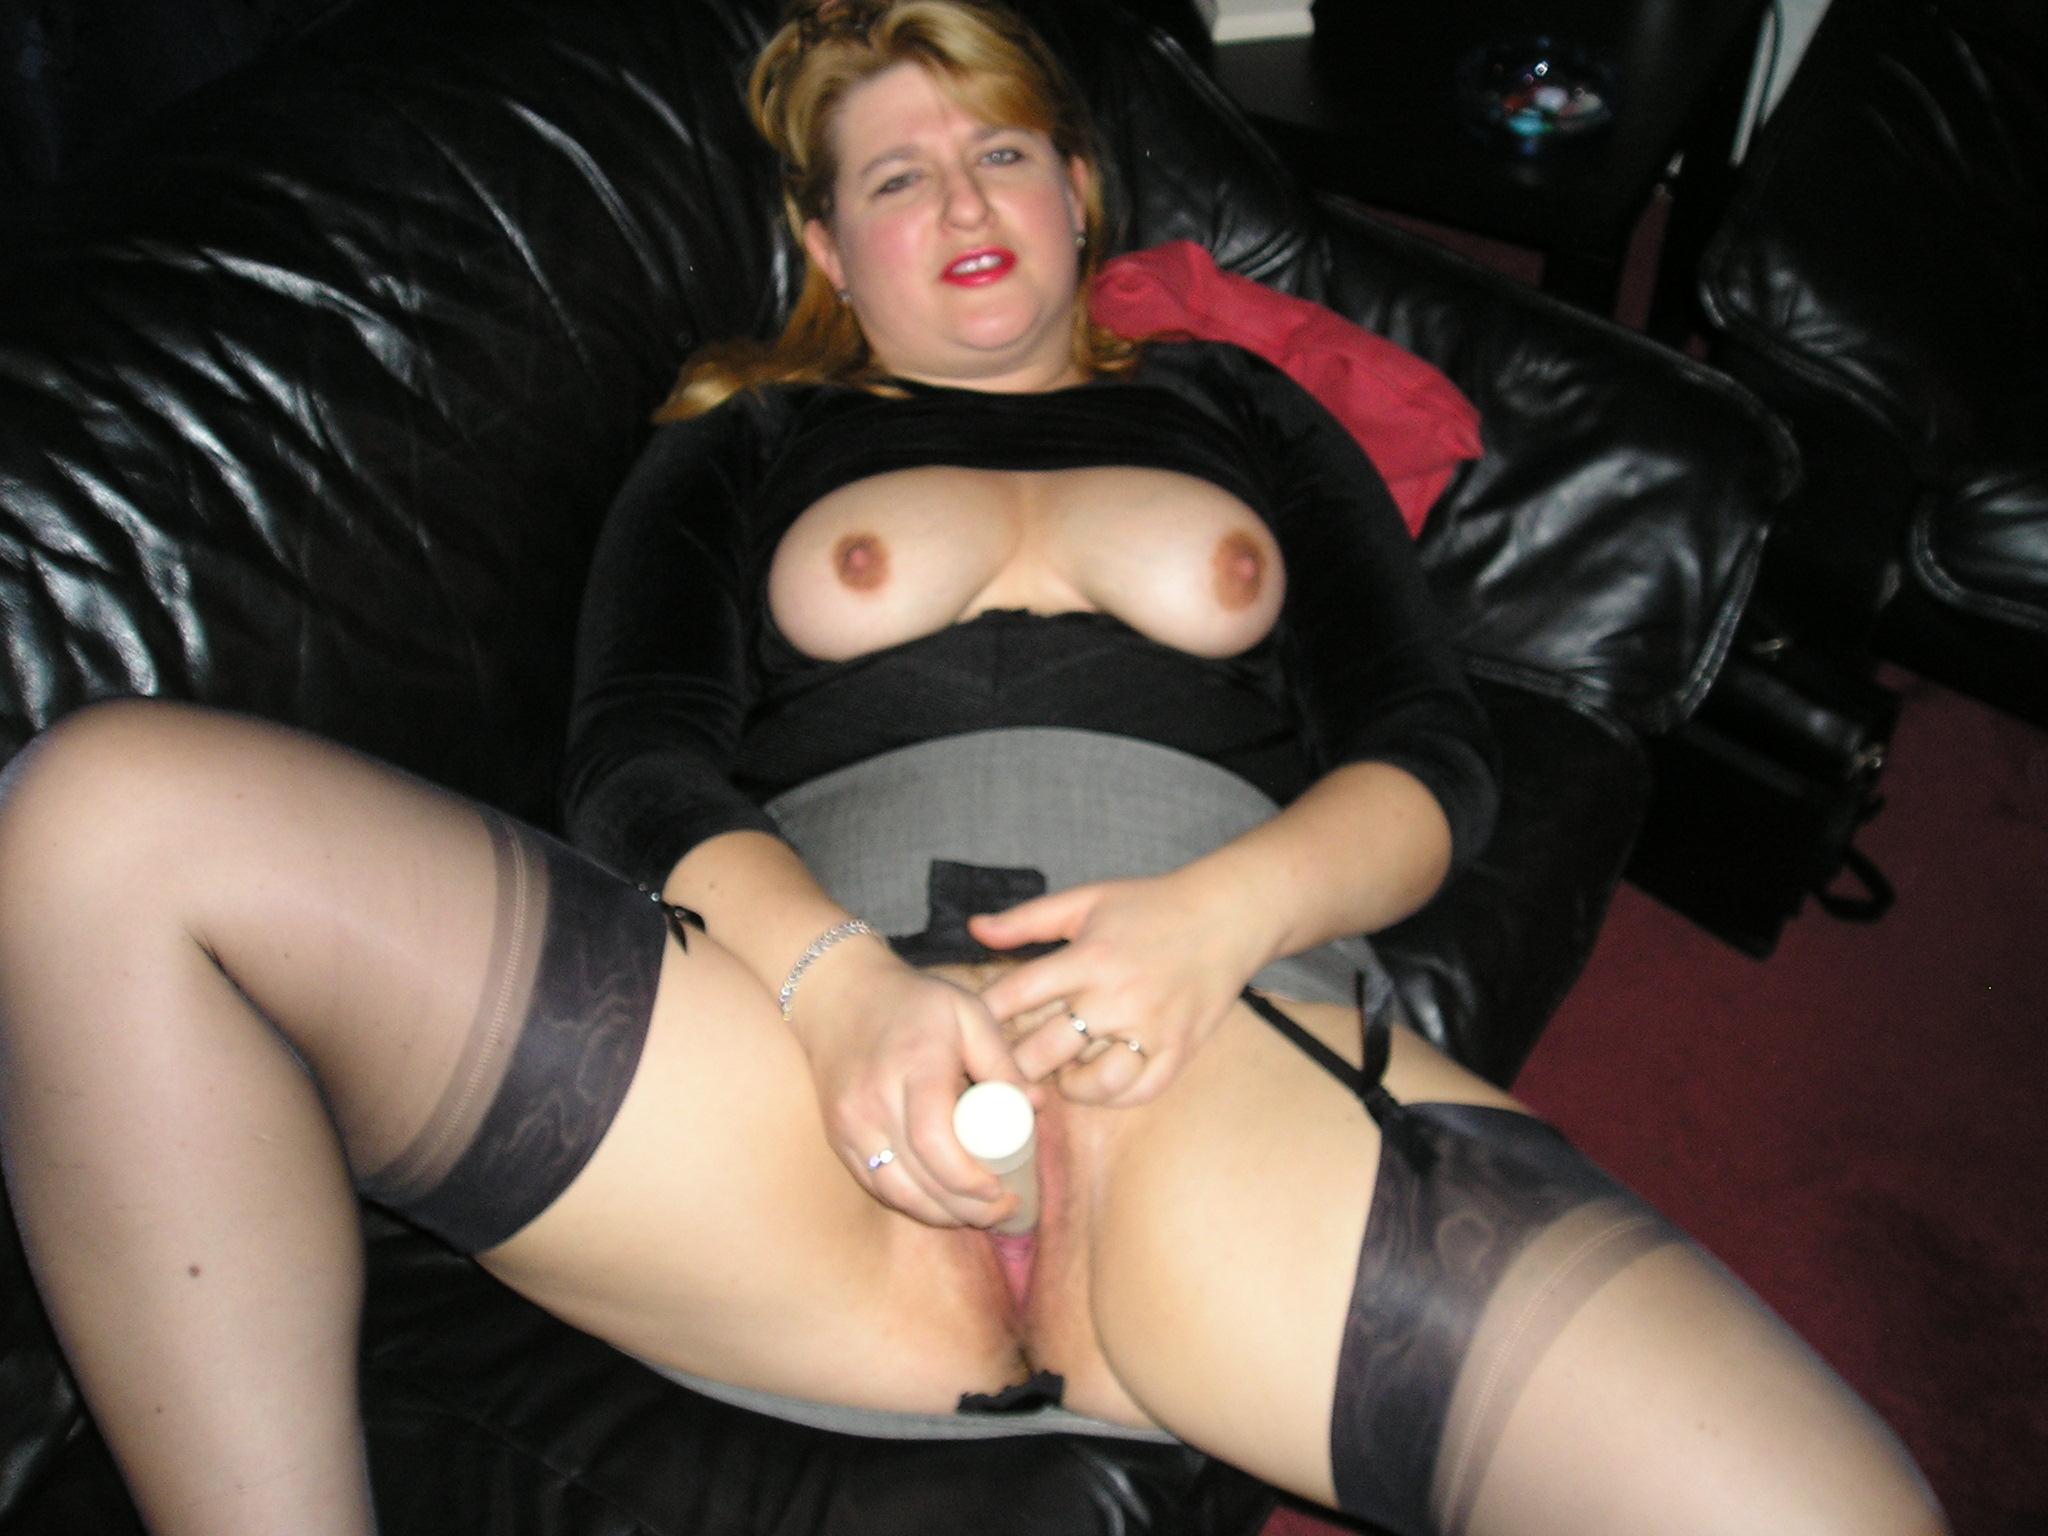 tette giganti gratis porno con ragazze